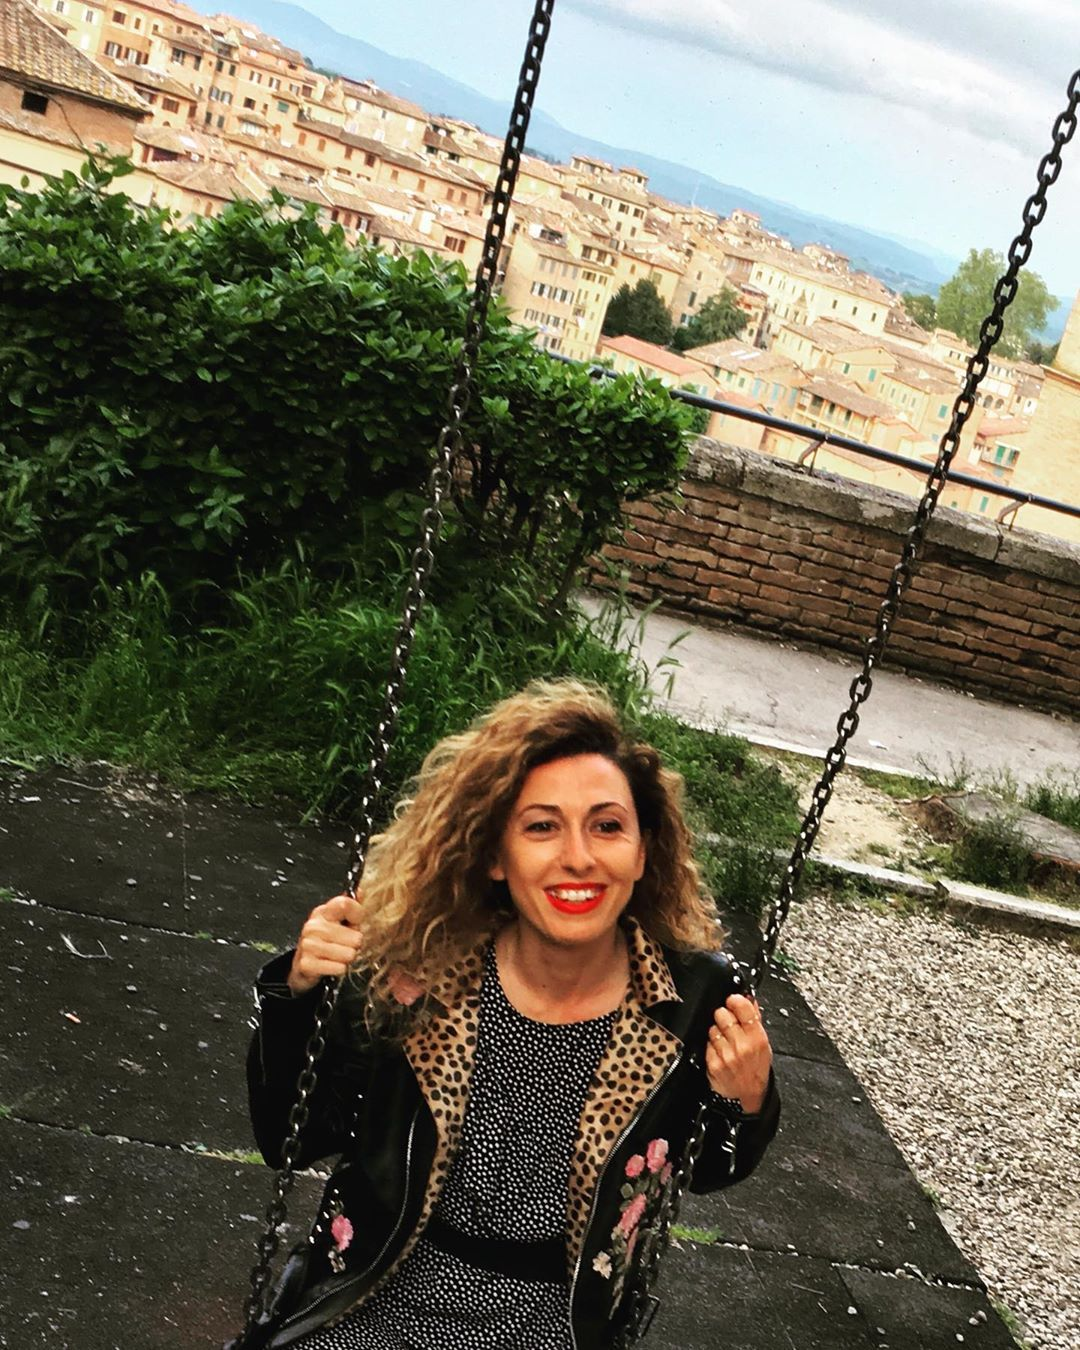 Life Is A Matter Of Balance Swing Siena Tuscany